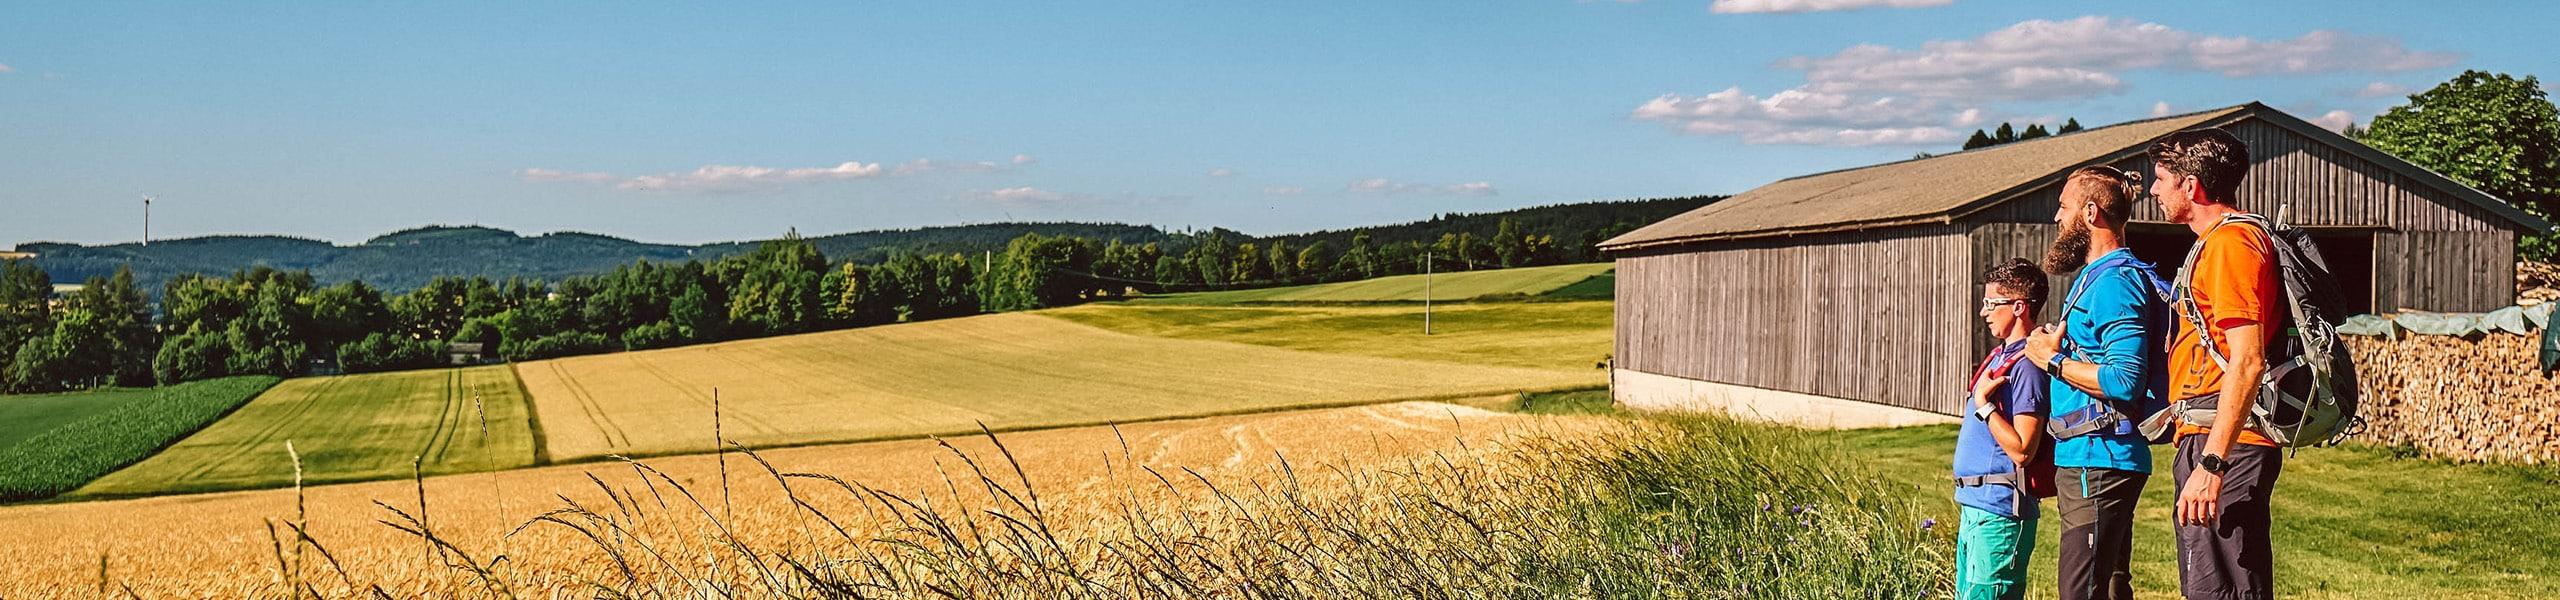 Goldenen Felder entlang des Nurtschweges bei Bärnau